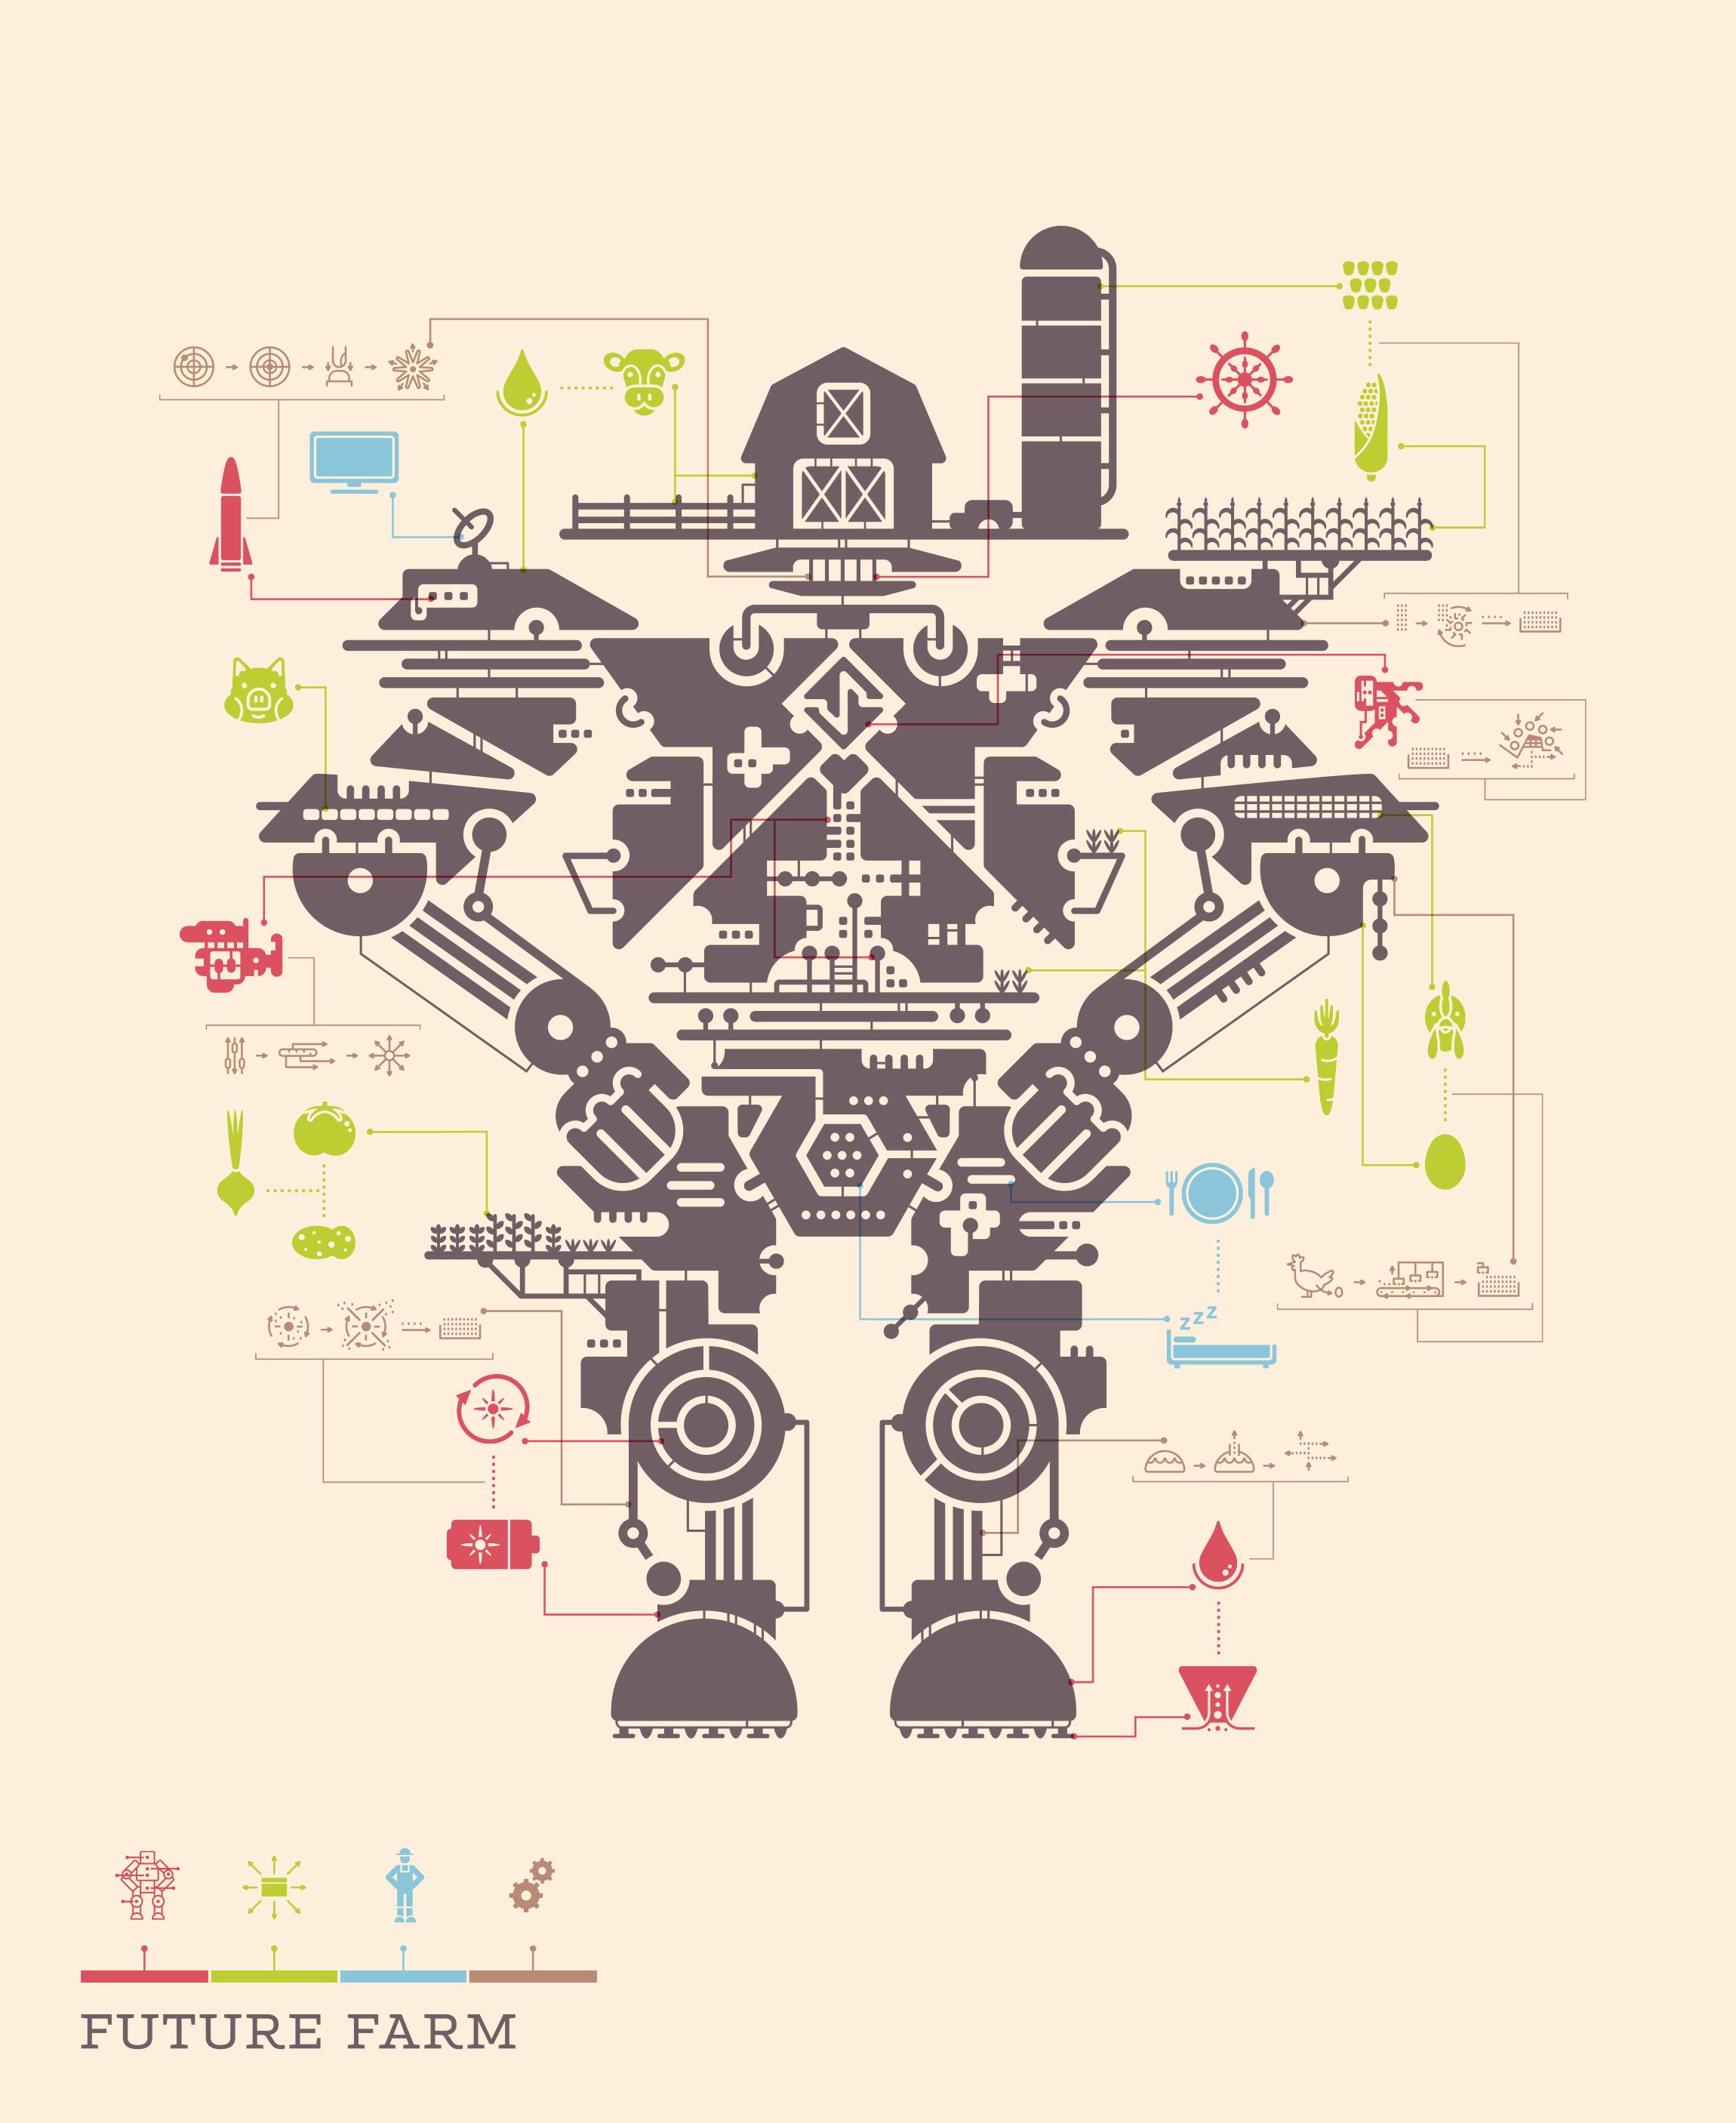 futurefarm.jpg